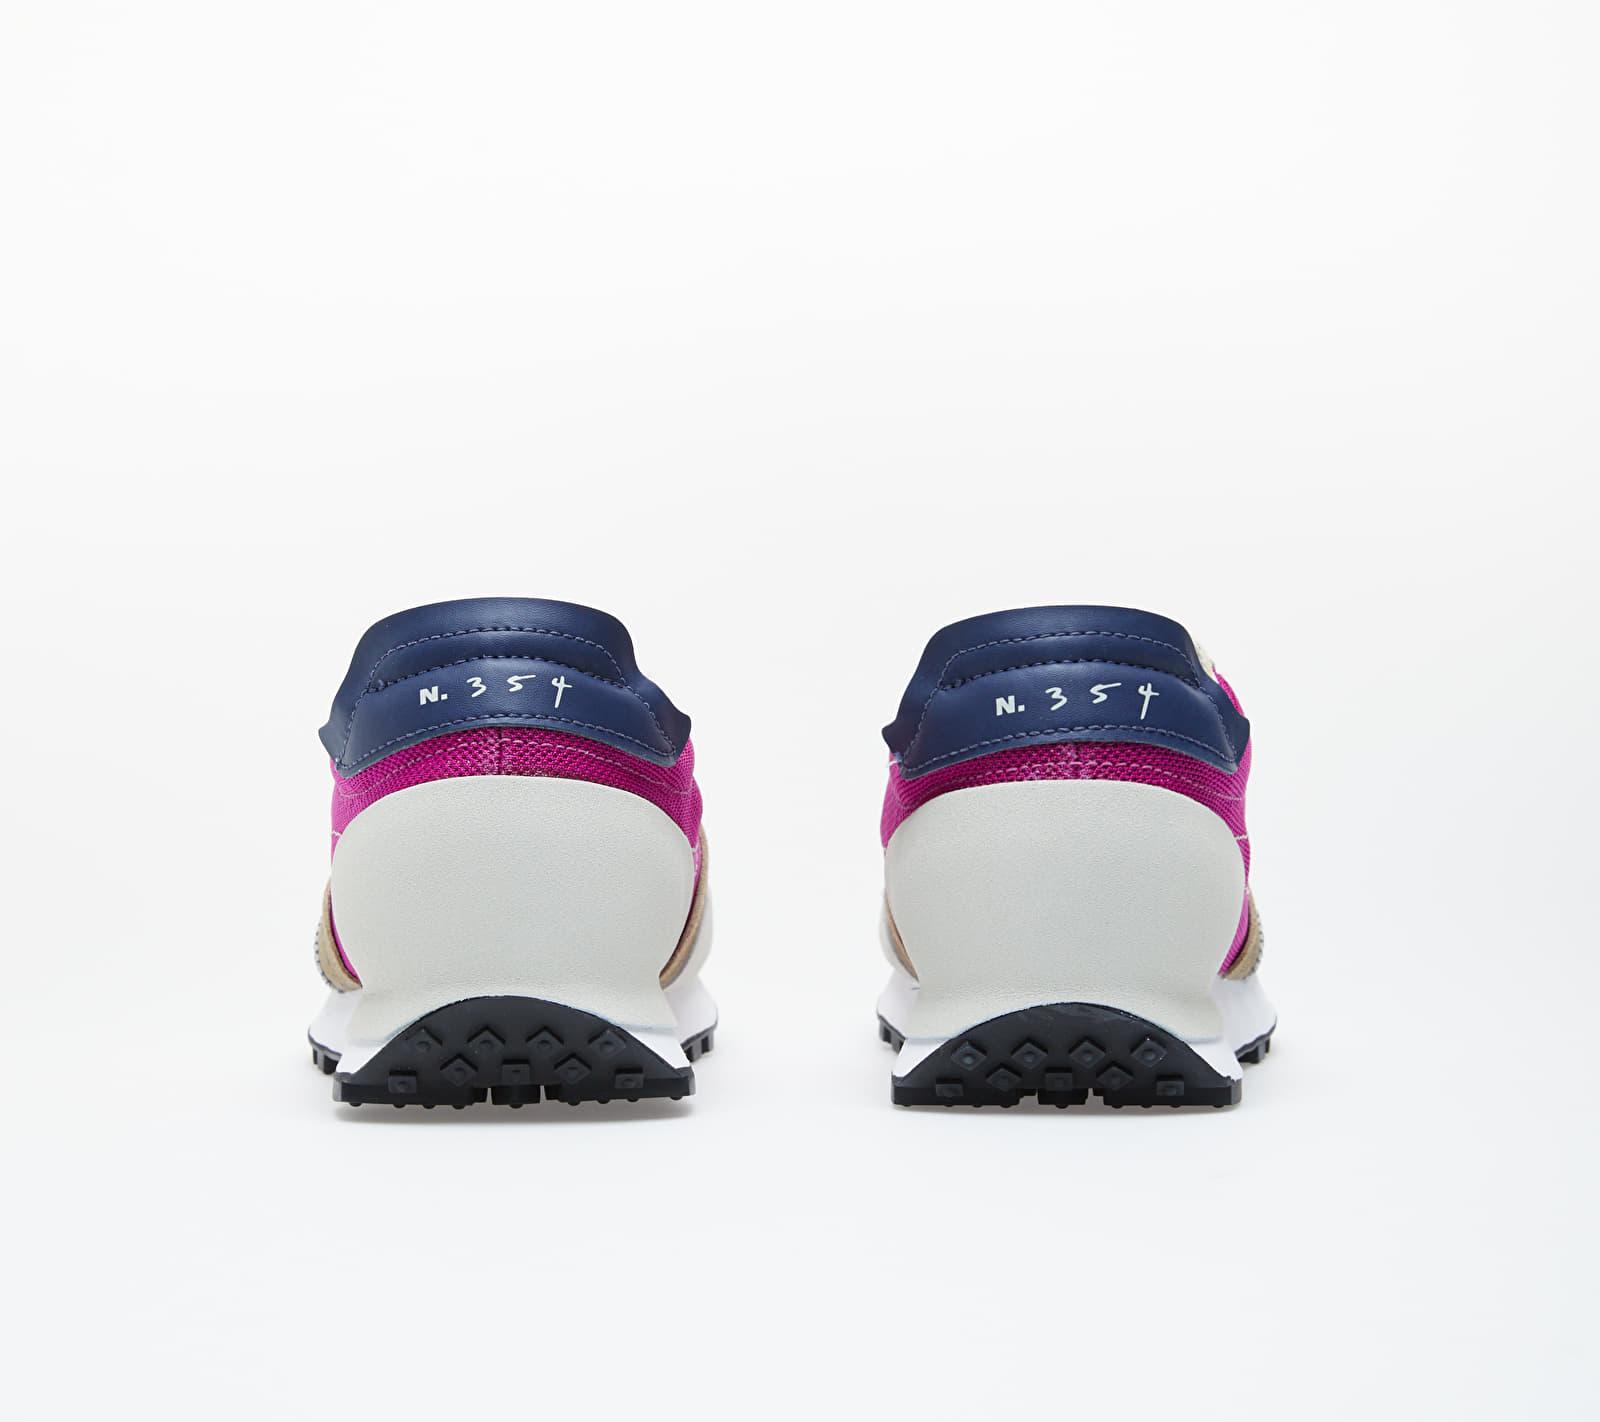 Nike Daybreak-Type Cactus Flower/ Light Bone-Midnight Navy, Multicolour